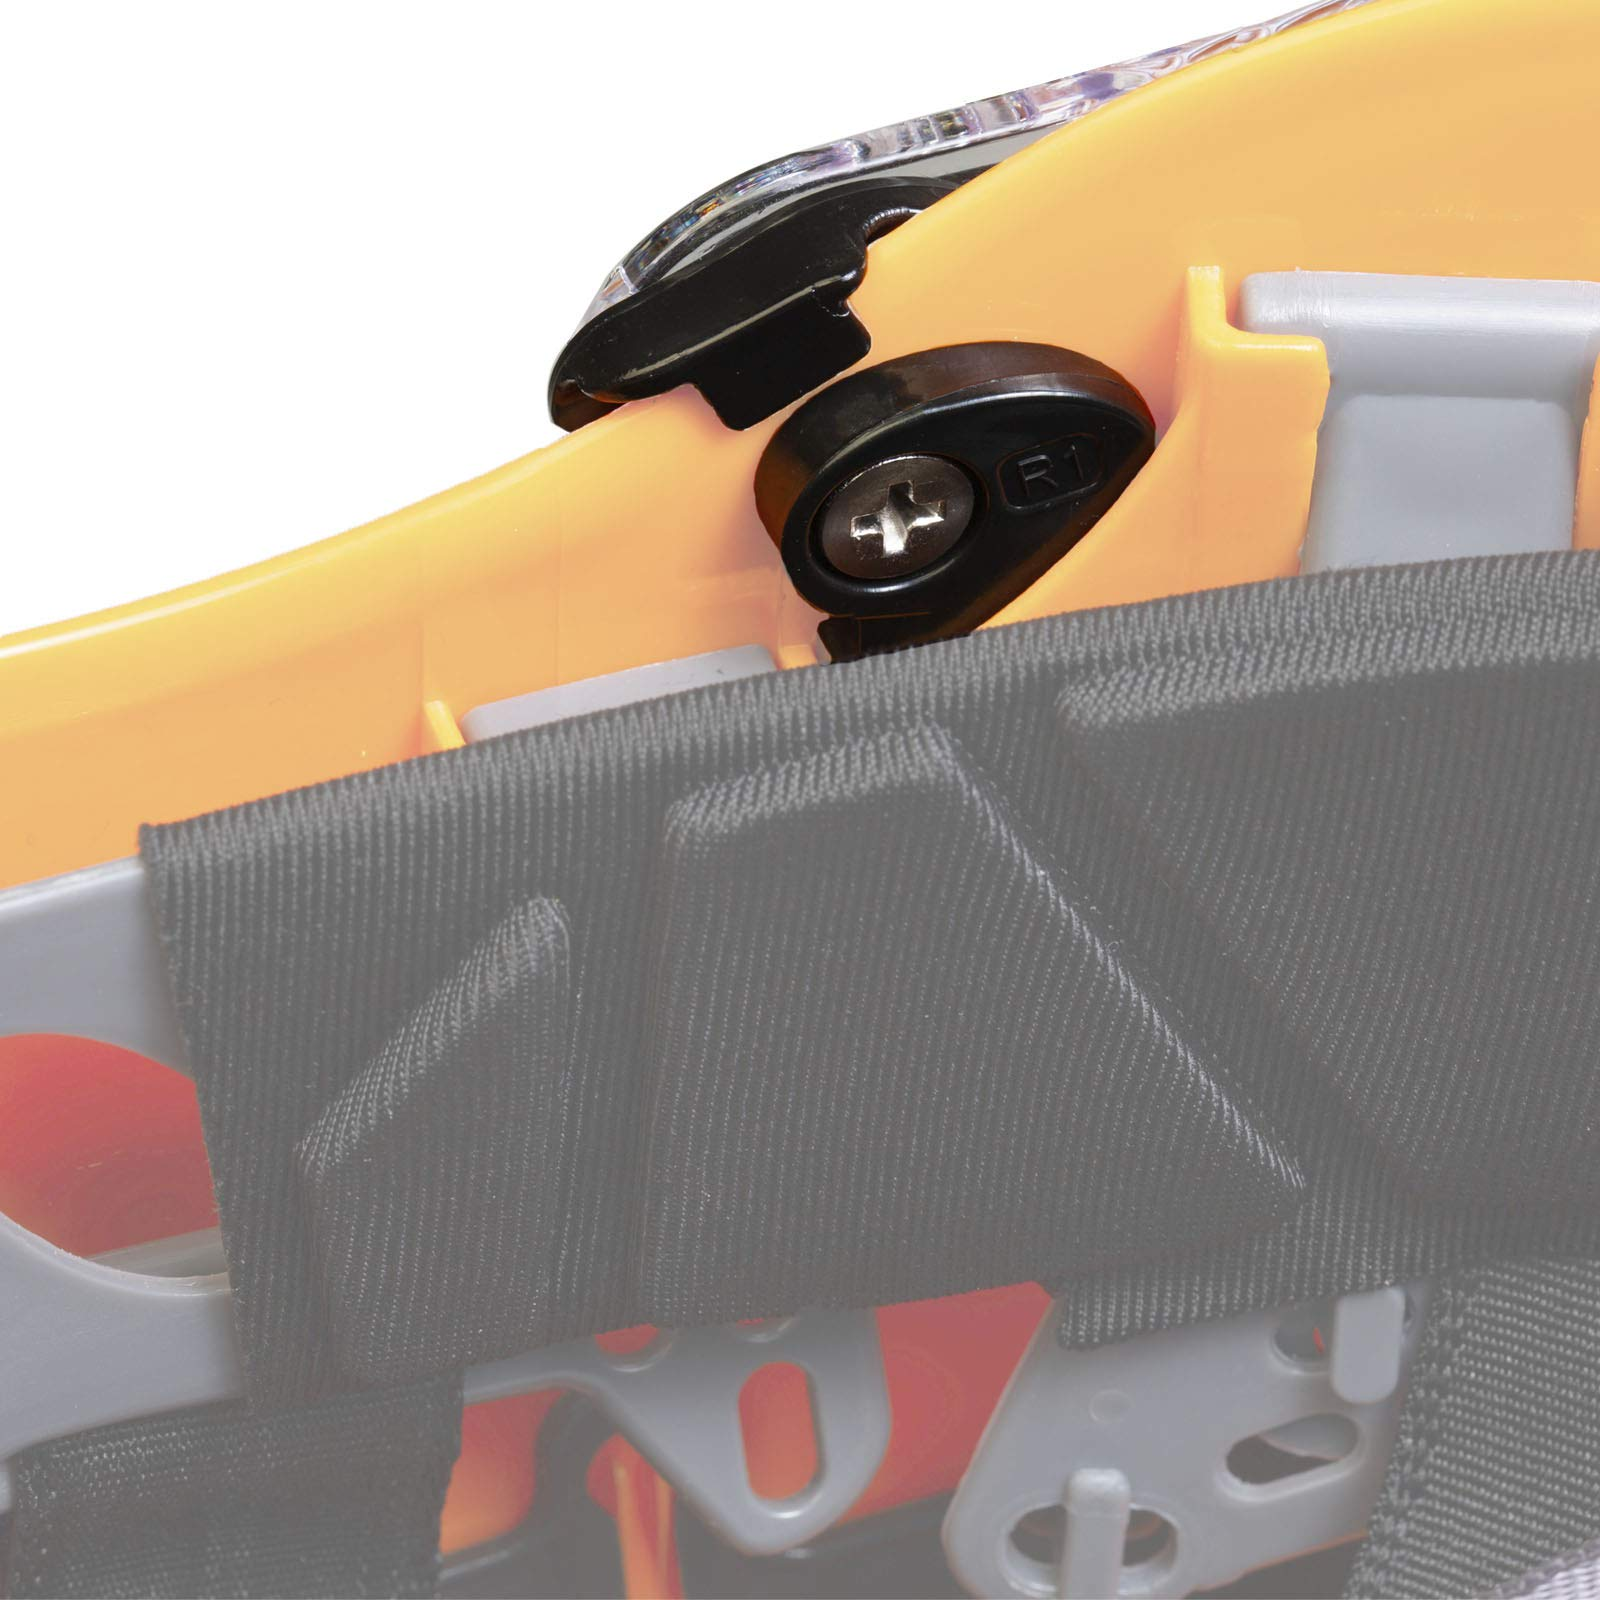 JORESTECH Sliding Retractable Integral Visor Shield for Helmet Mounted Eye Protection PPE by JORESTECH (Image #3)